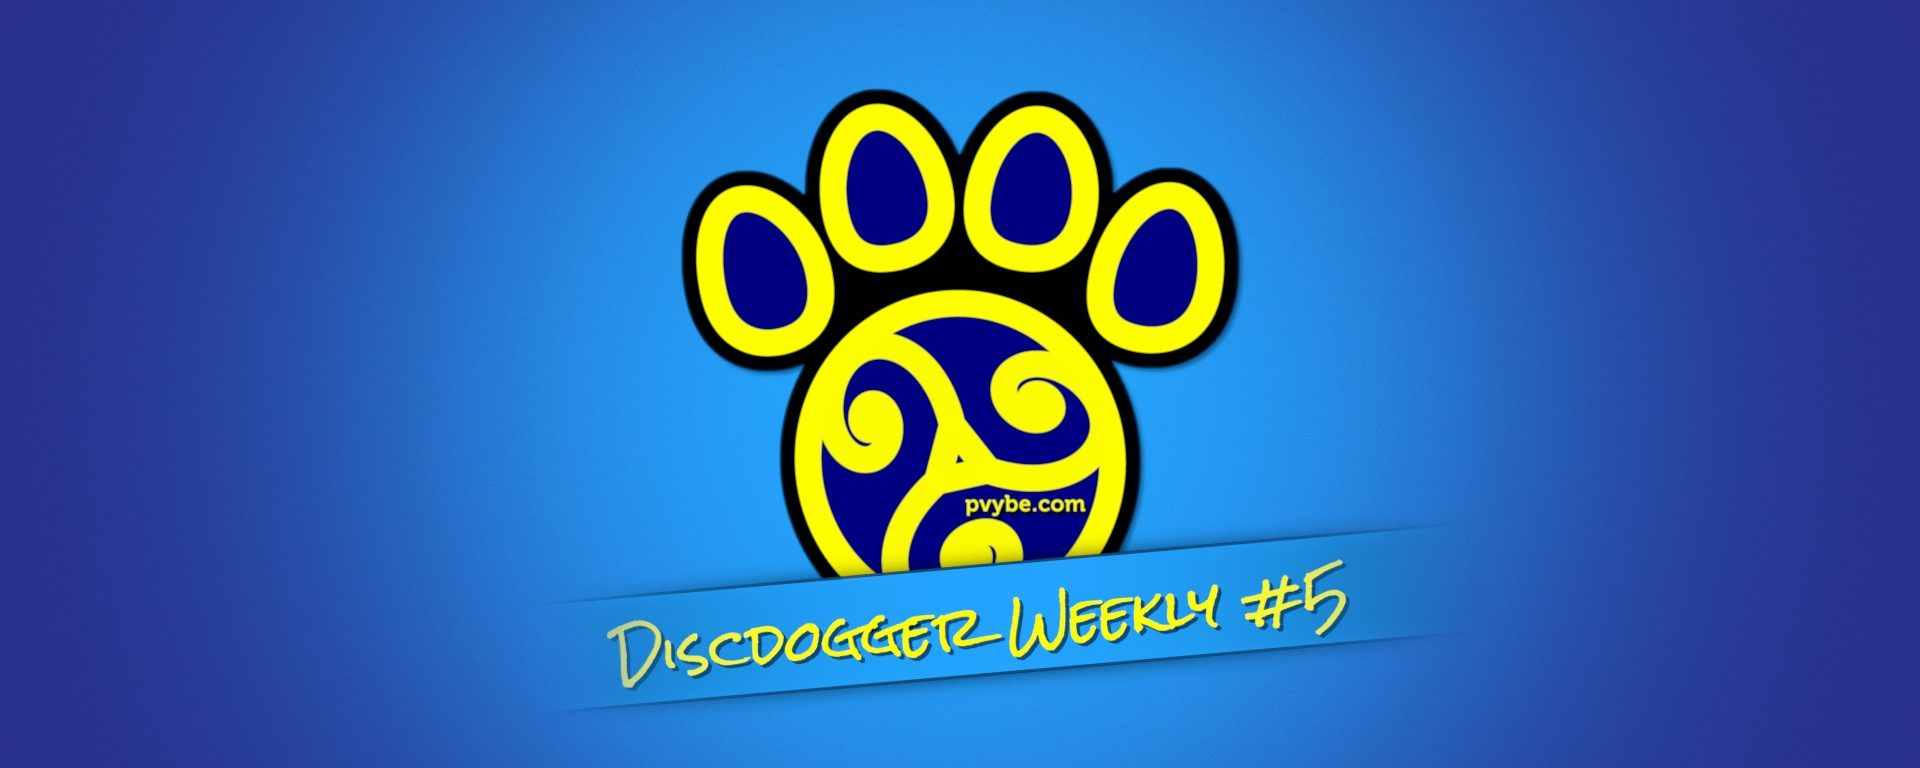 DiscDogger Weekly #5